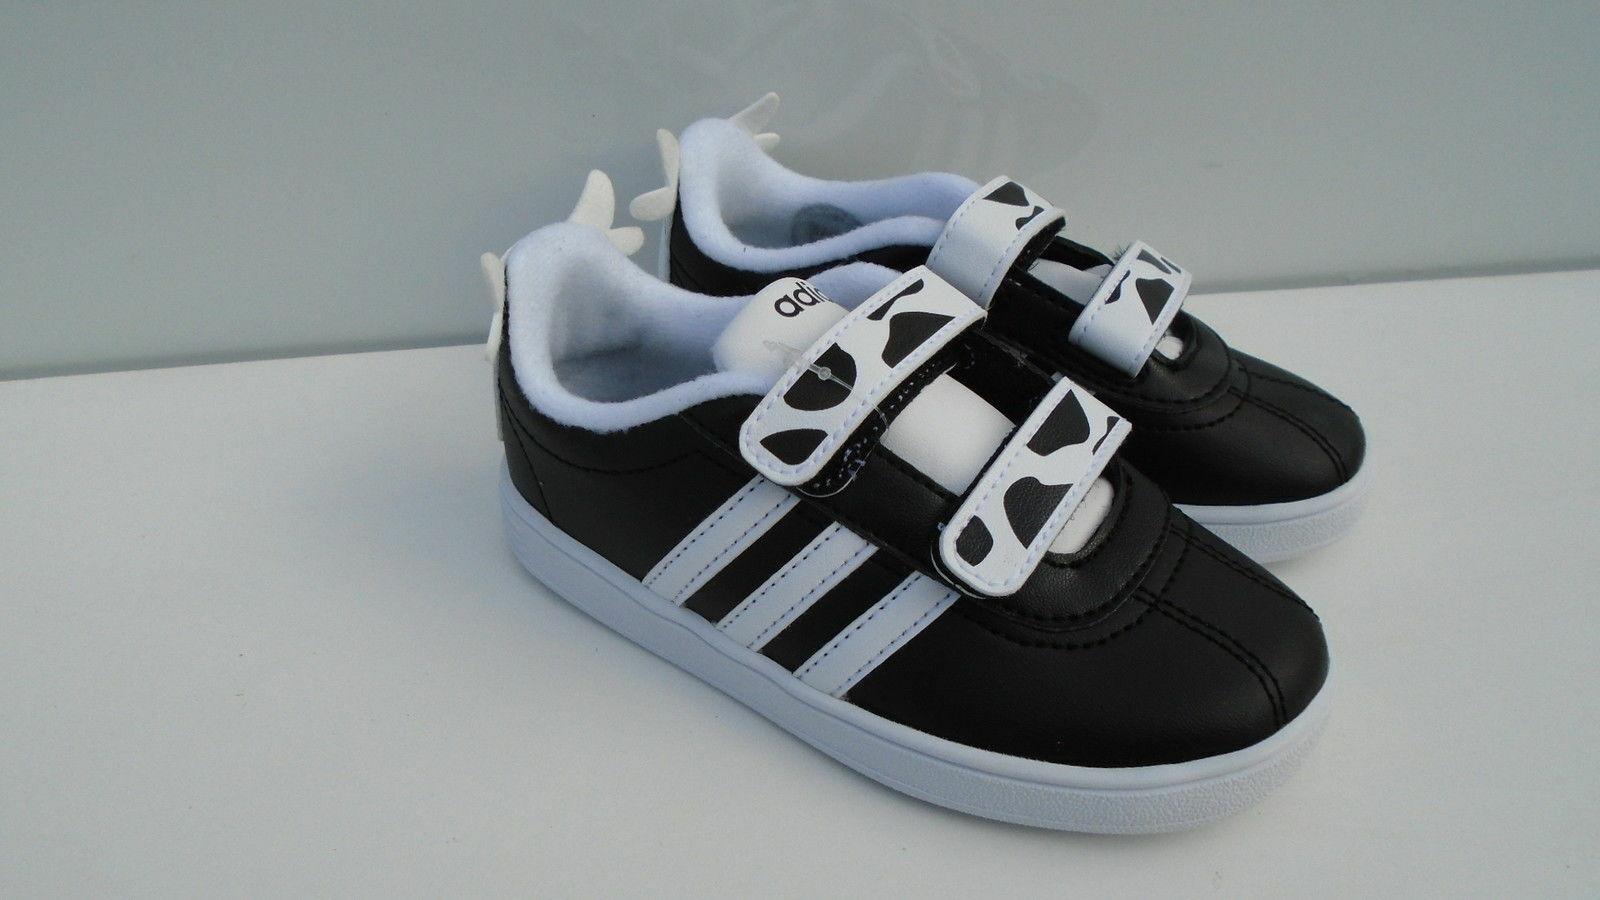 Adidas Kinderschuhe Gr 27 Test Vergleich +++ Adidas